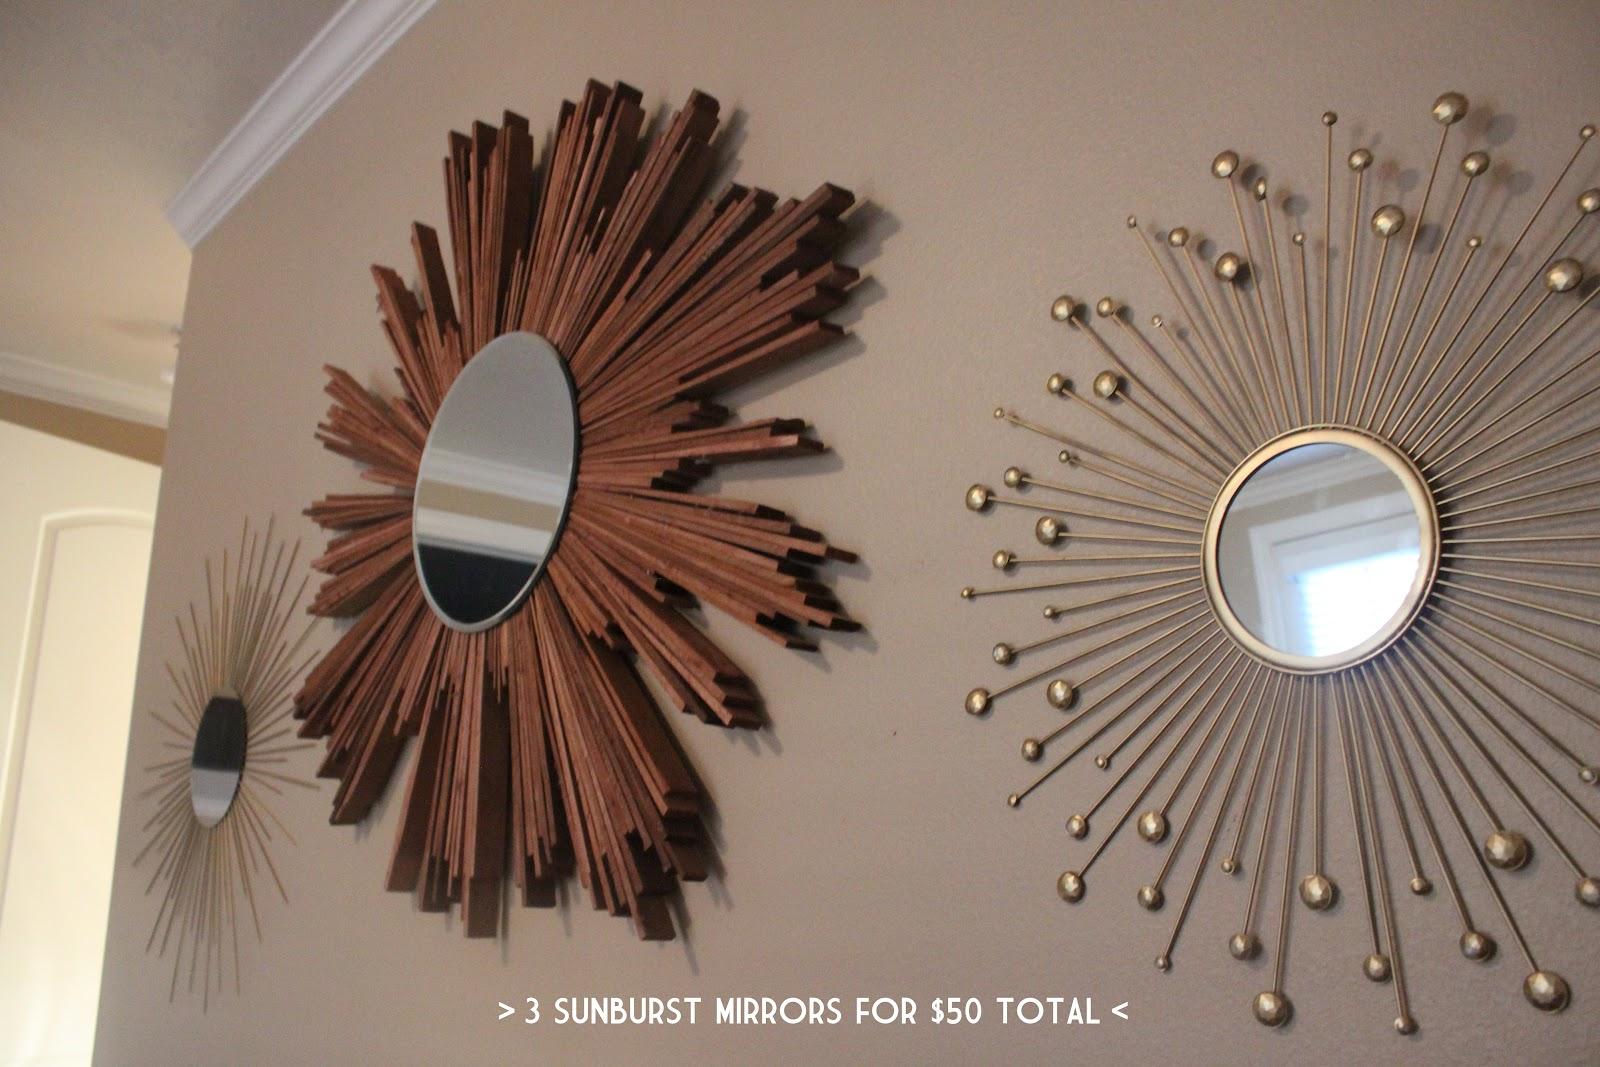 Diy Mirror Ruffling Feathers Wall Of Sunburst Mirrors Diy